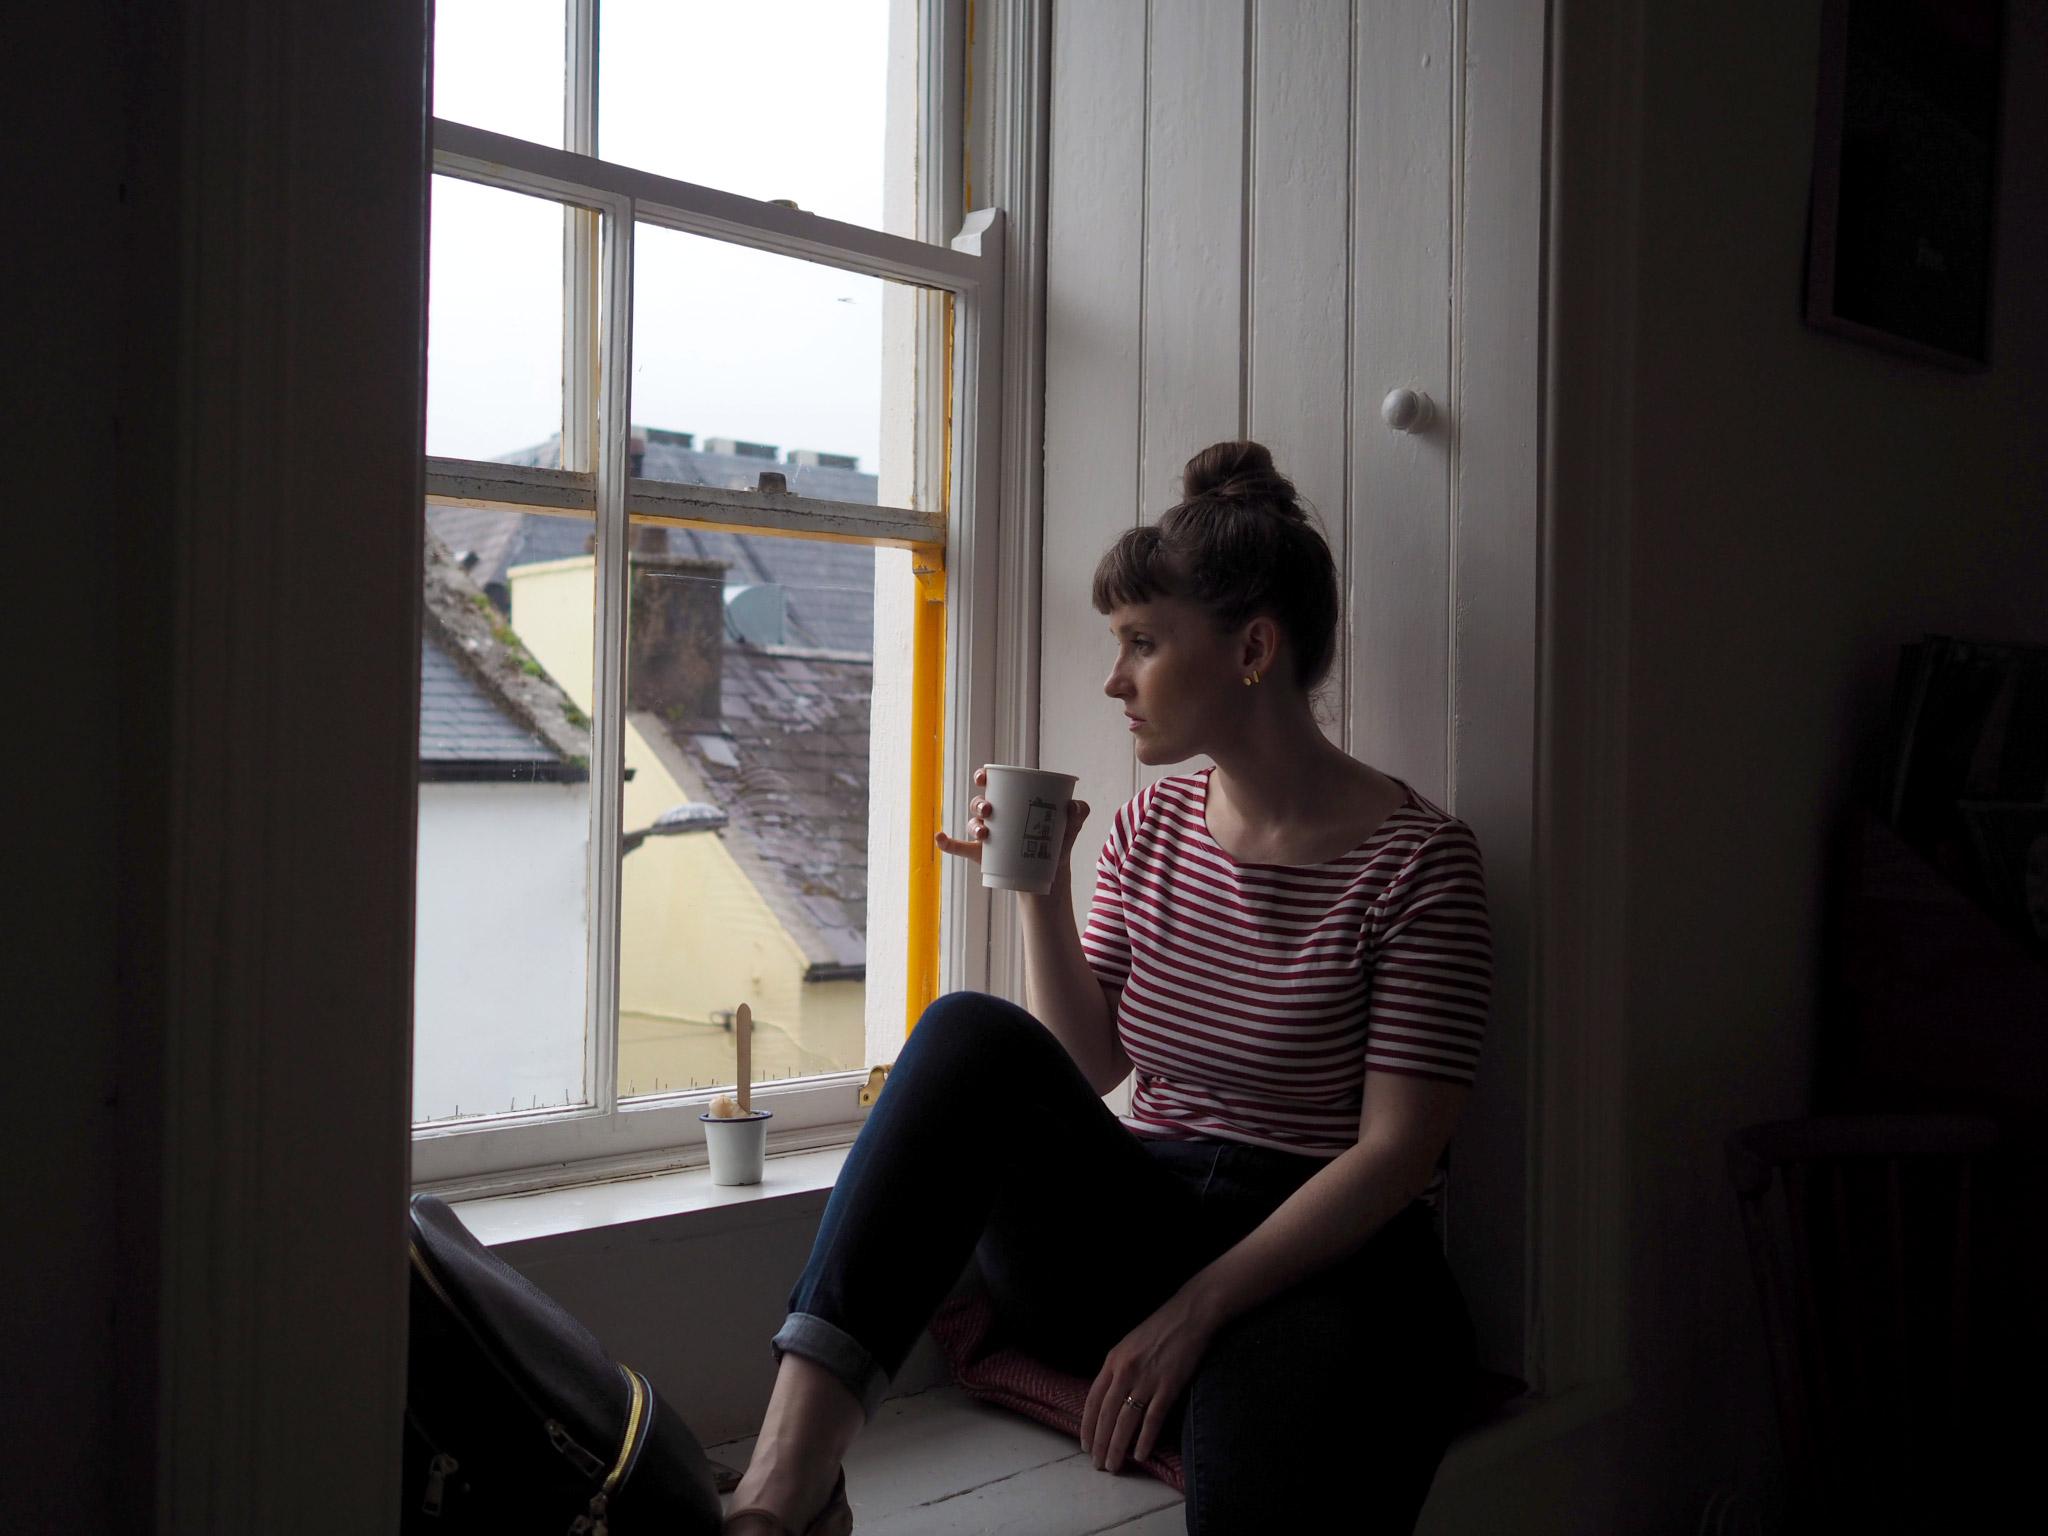 Tea and coffee at Coffeewerk + Press in Galway